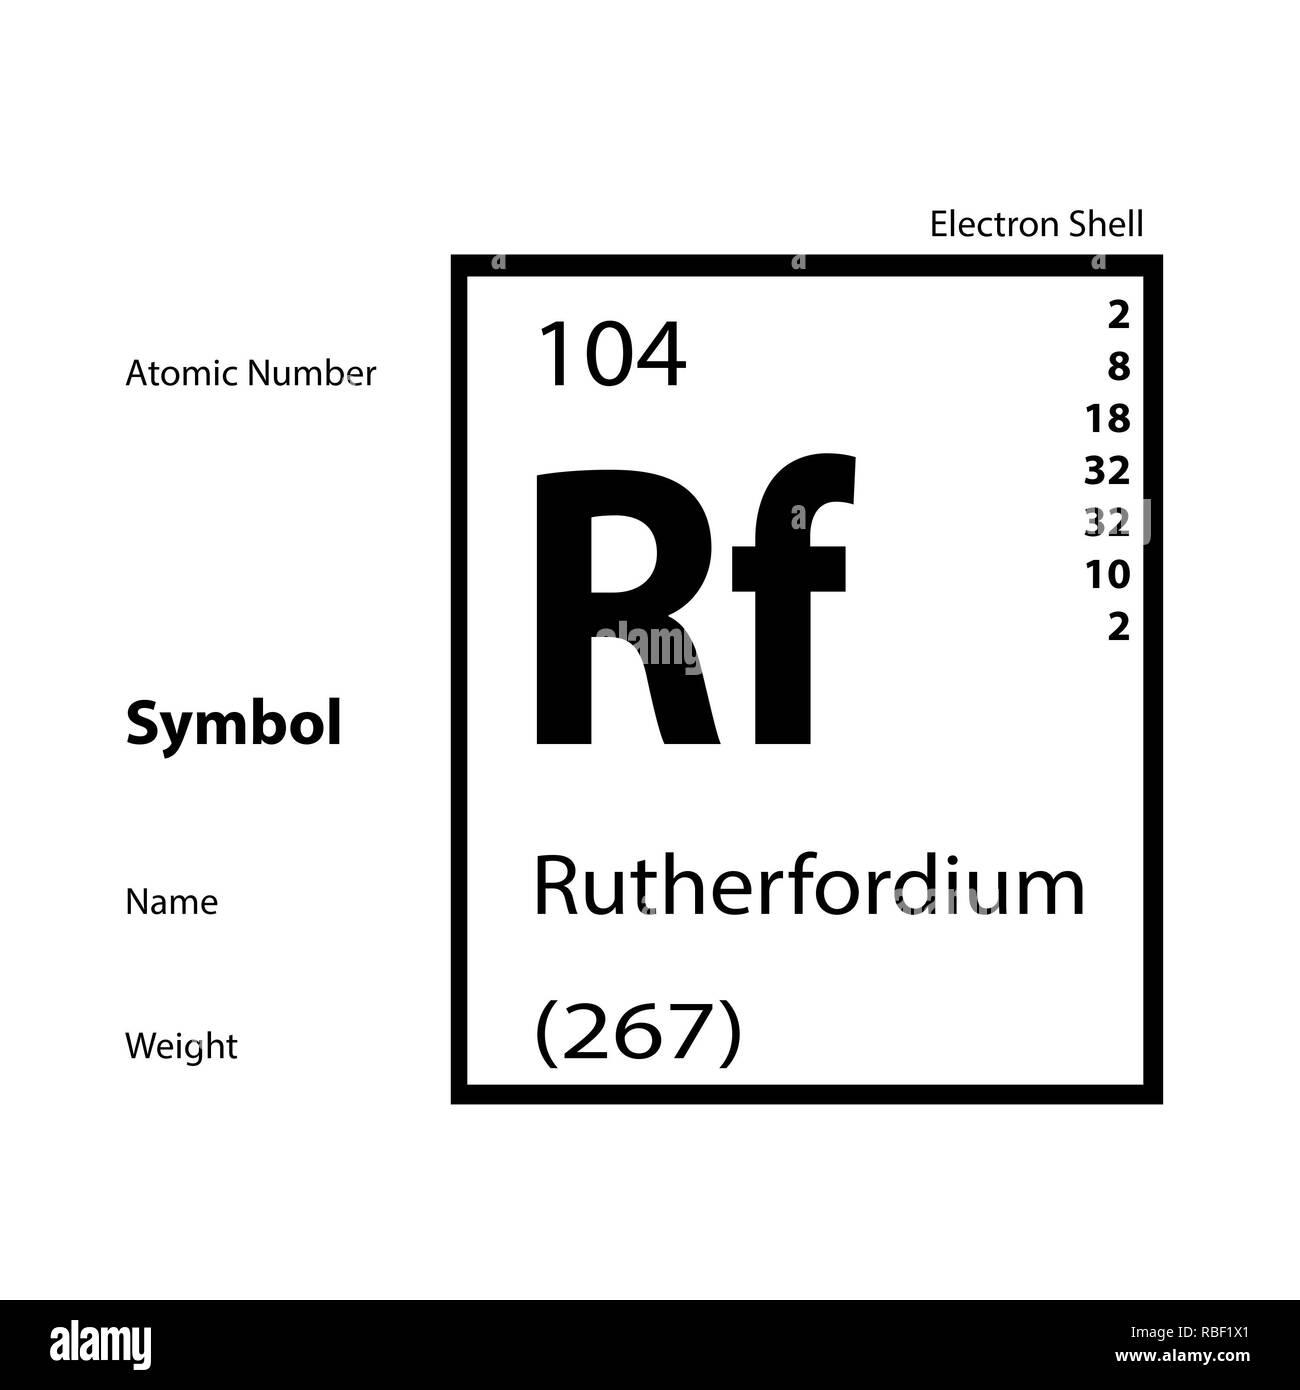 Periodic table - 104 Rutherfordium Stock Photo